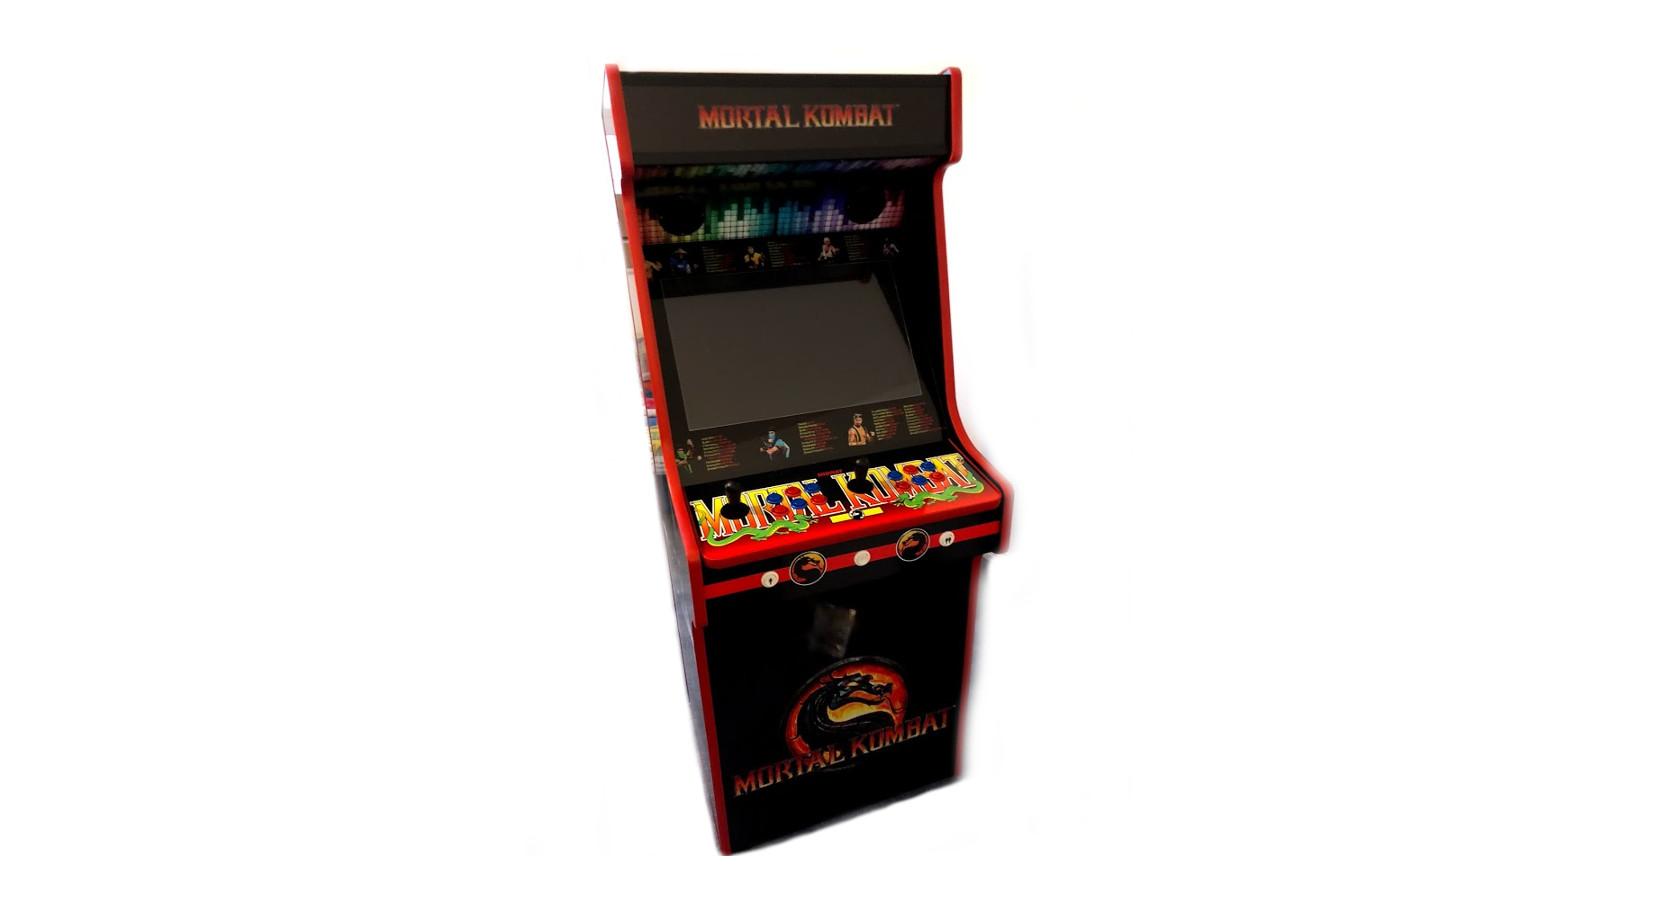 Classic Upright Arcade Machine - Mortal Kombat theme - v4 - front photo